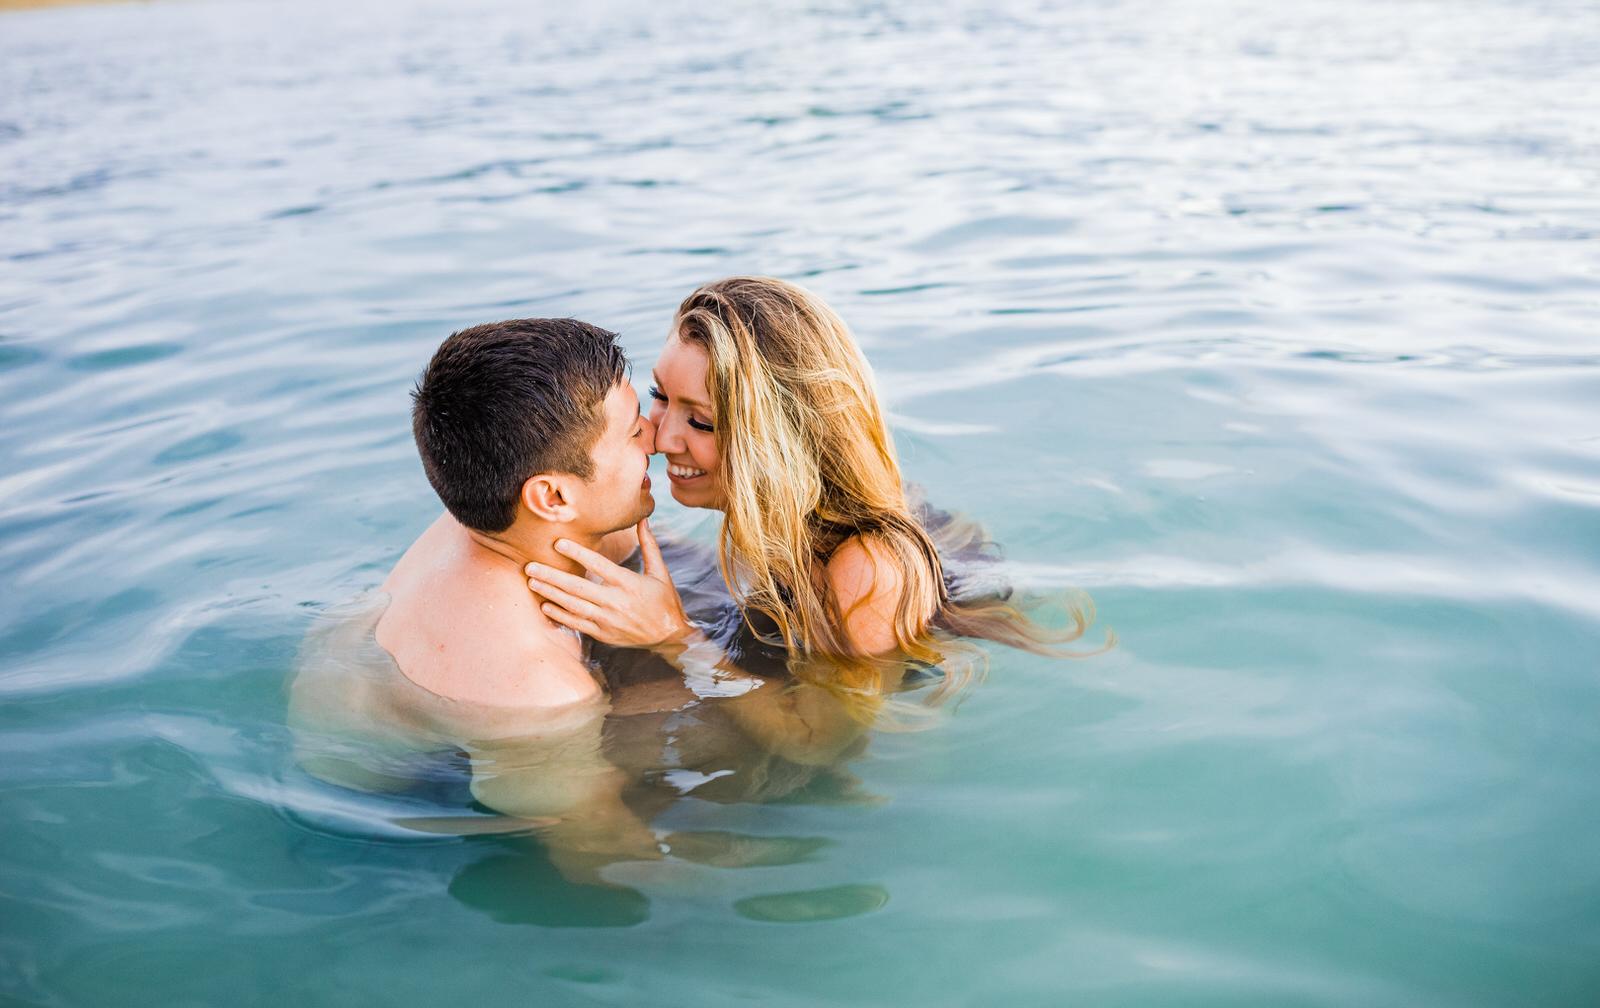 sunset-adventurous-couple-water-session-hilton-hawaii-13.jpg